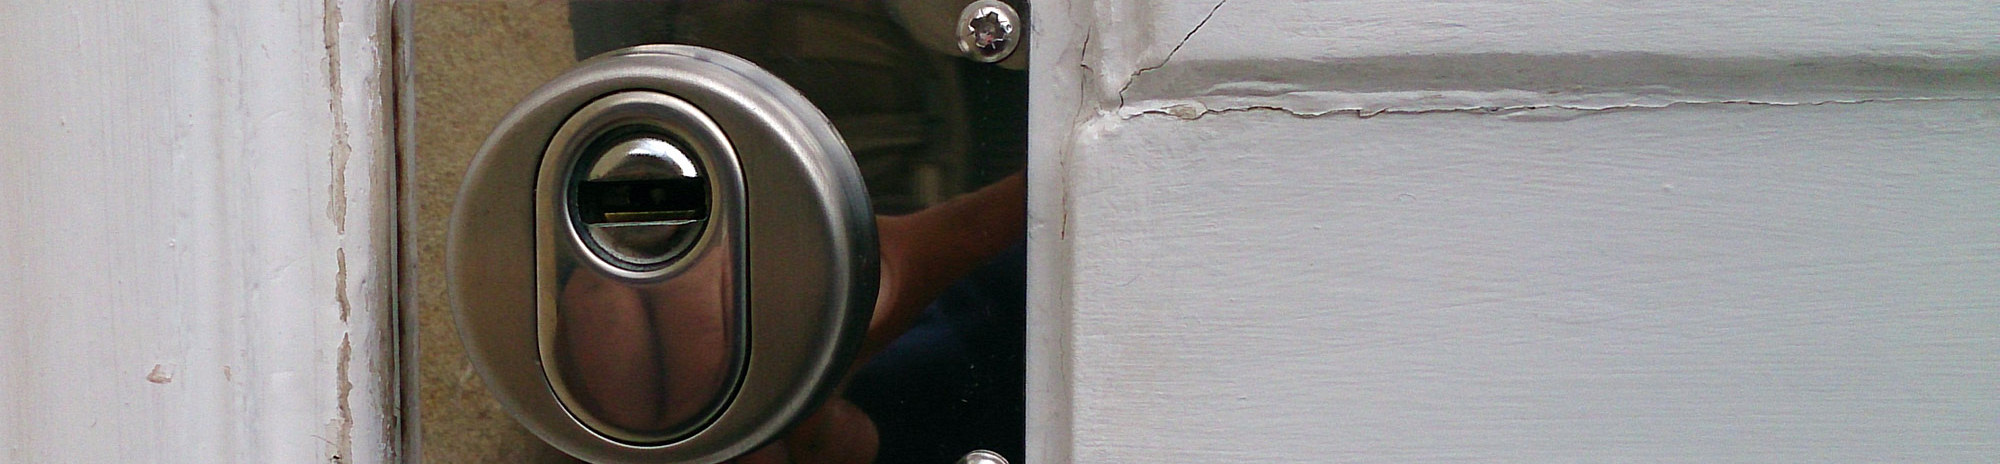 serrure-cylindre-blinde-merignac